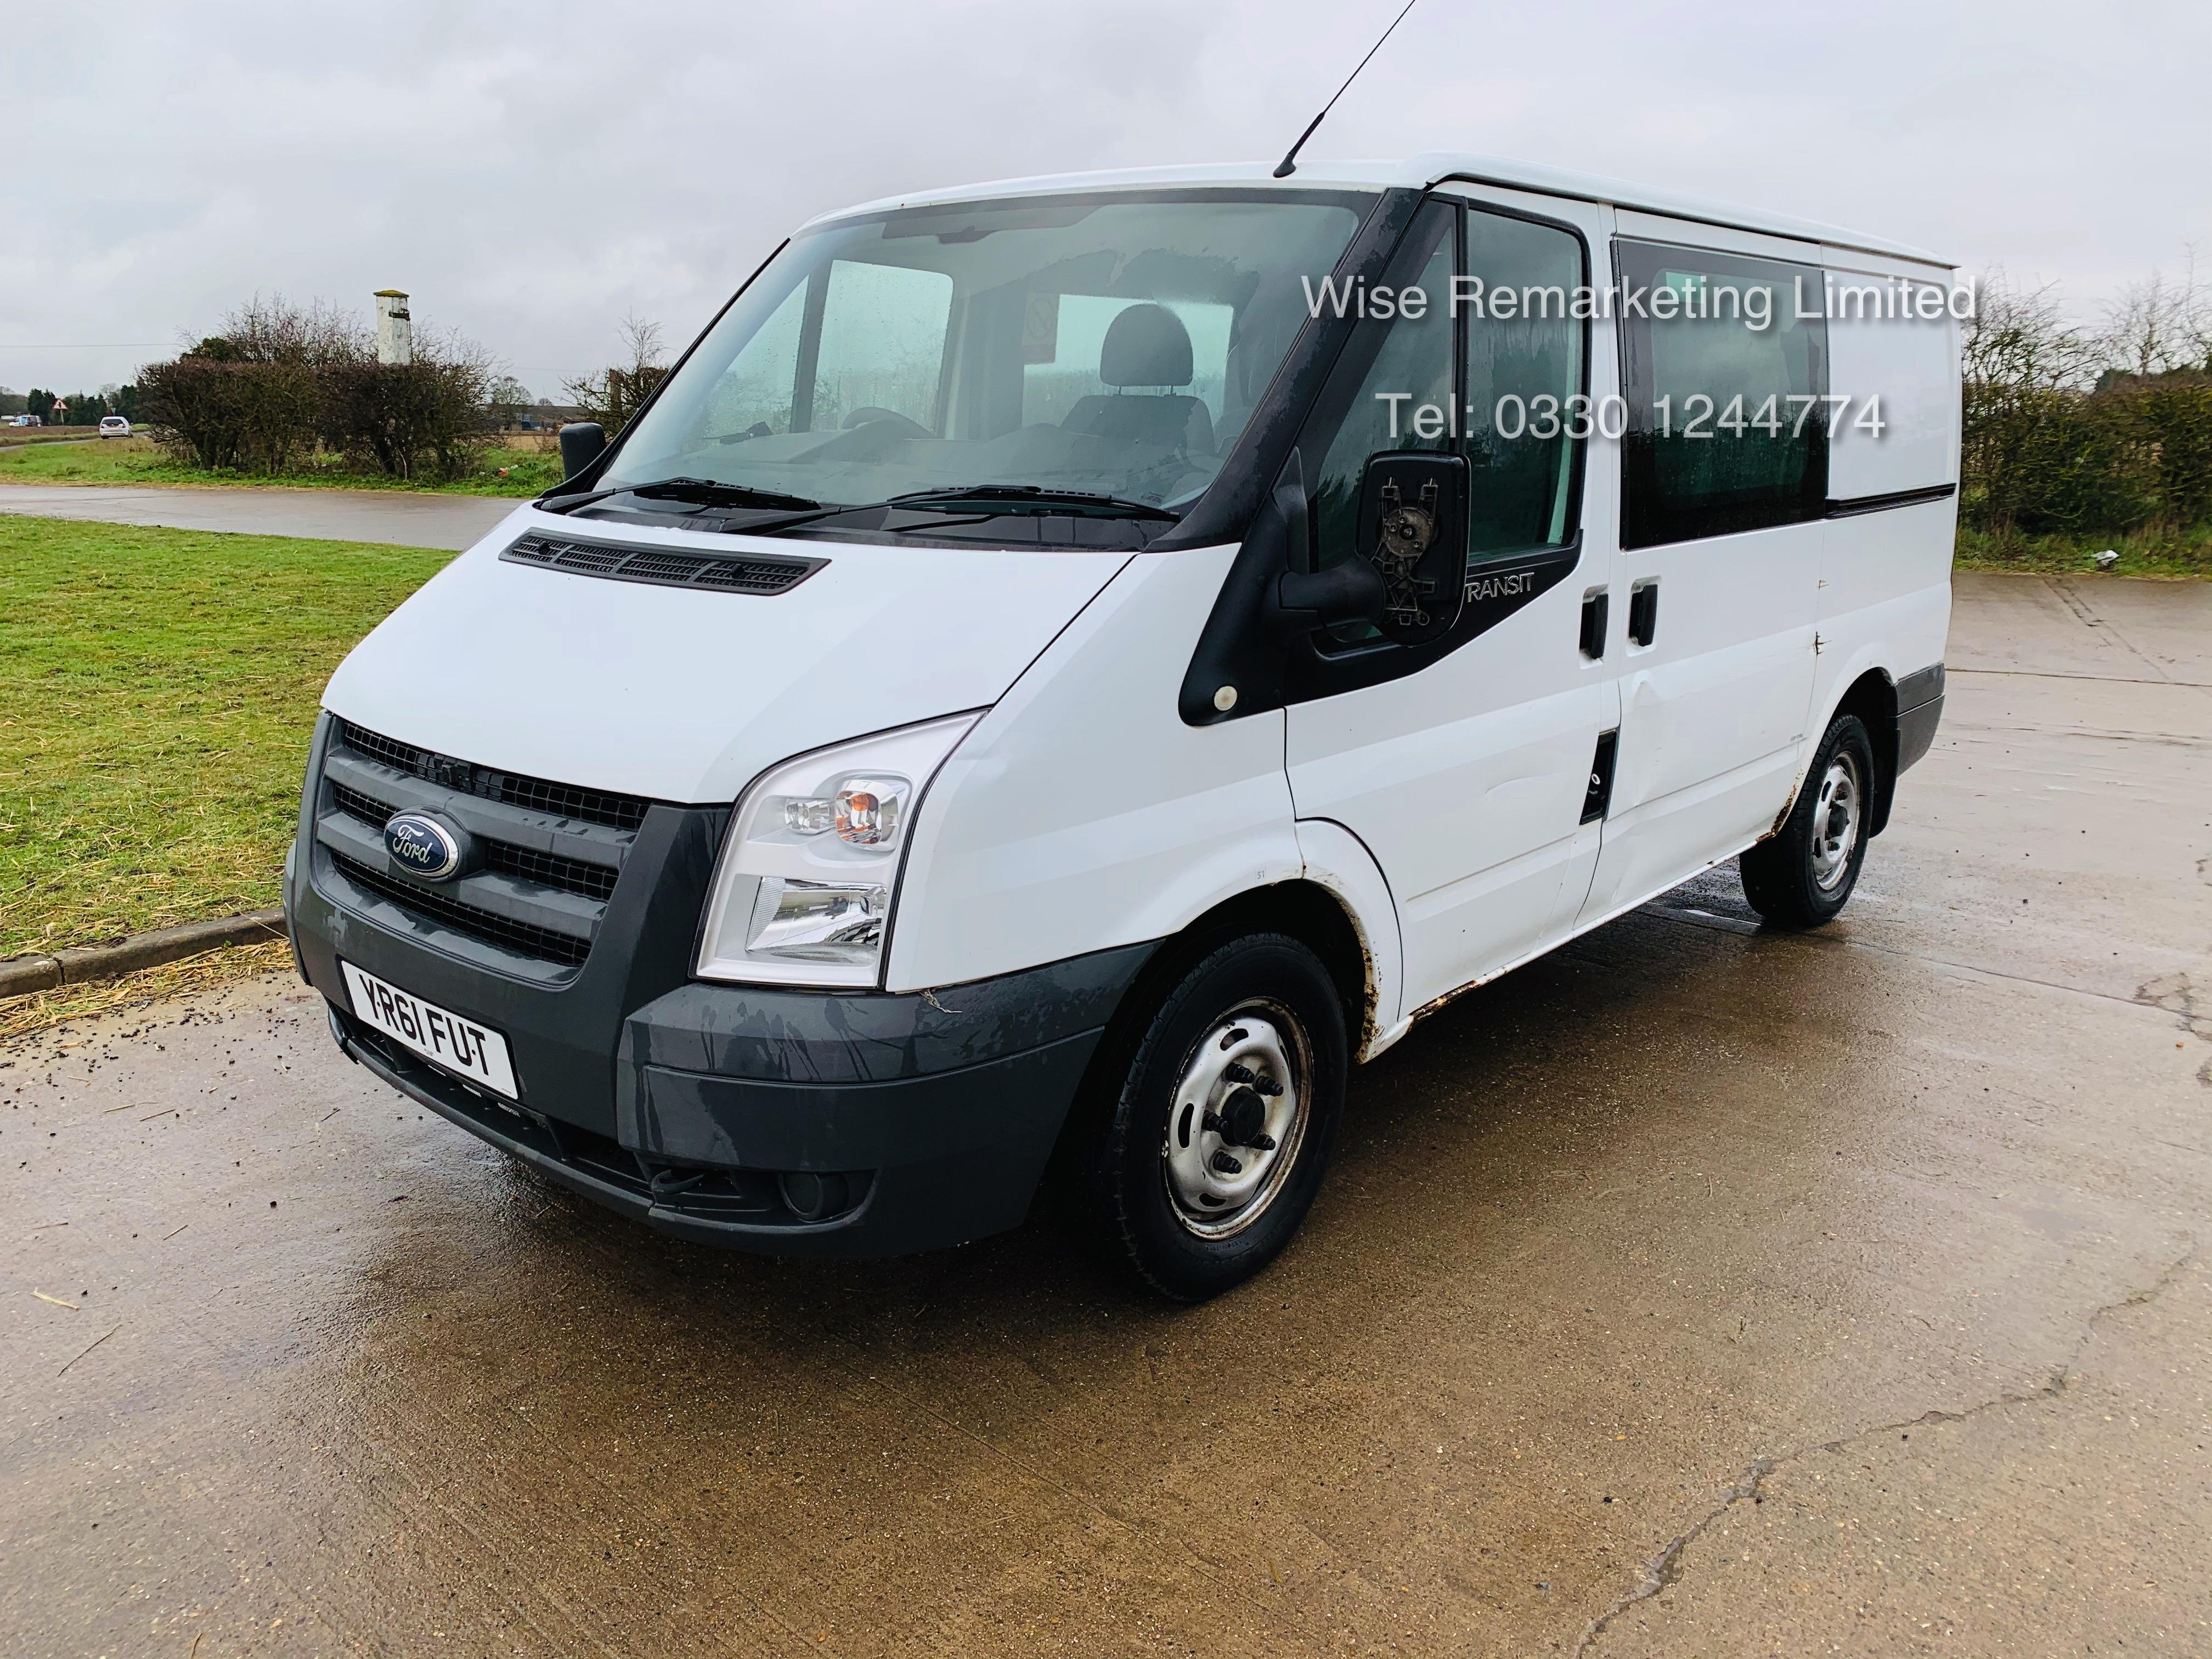 (RESERVE MET) Ford Transit T280 2.2 TDCI Dualliner Crew Van (6 Seater) - 2012 Model - 1 Year MOT